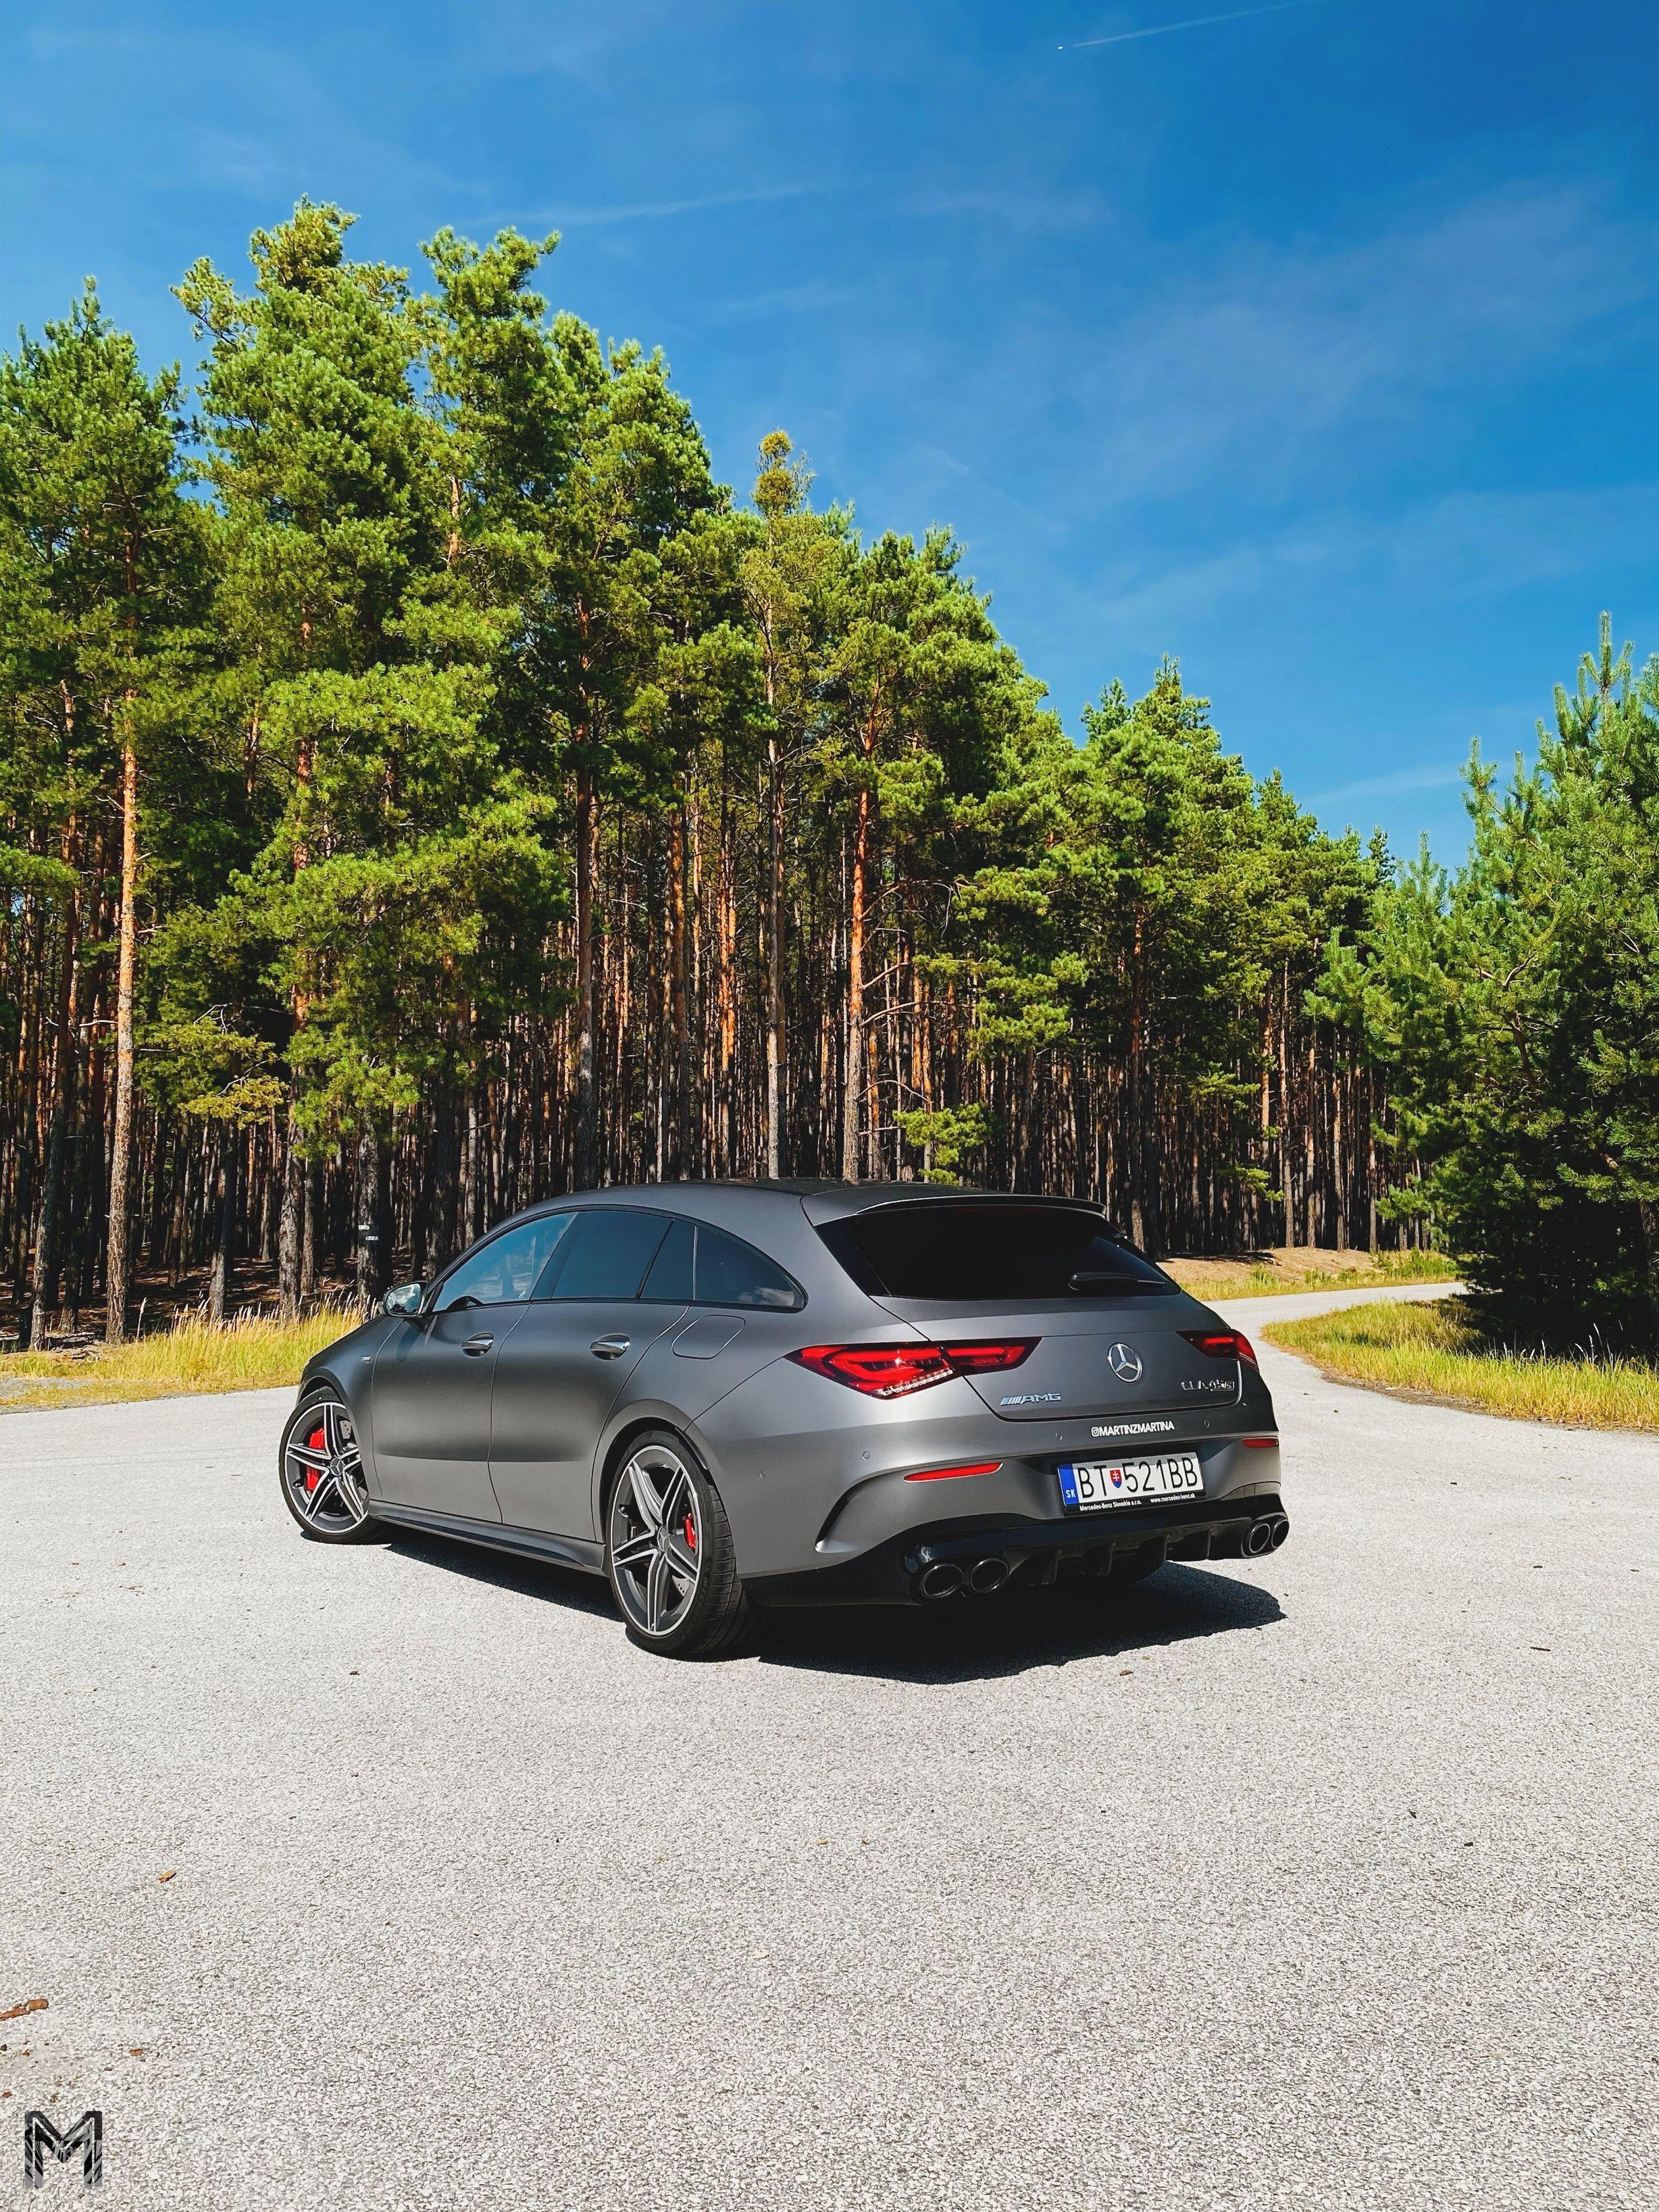 Mercedes-AMG CLA 45 S test oktober